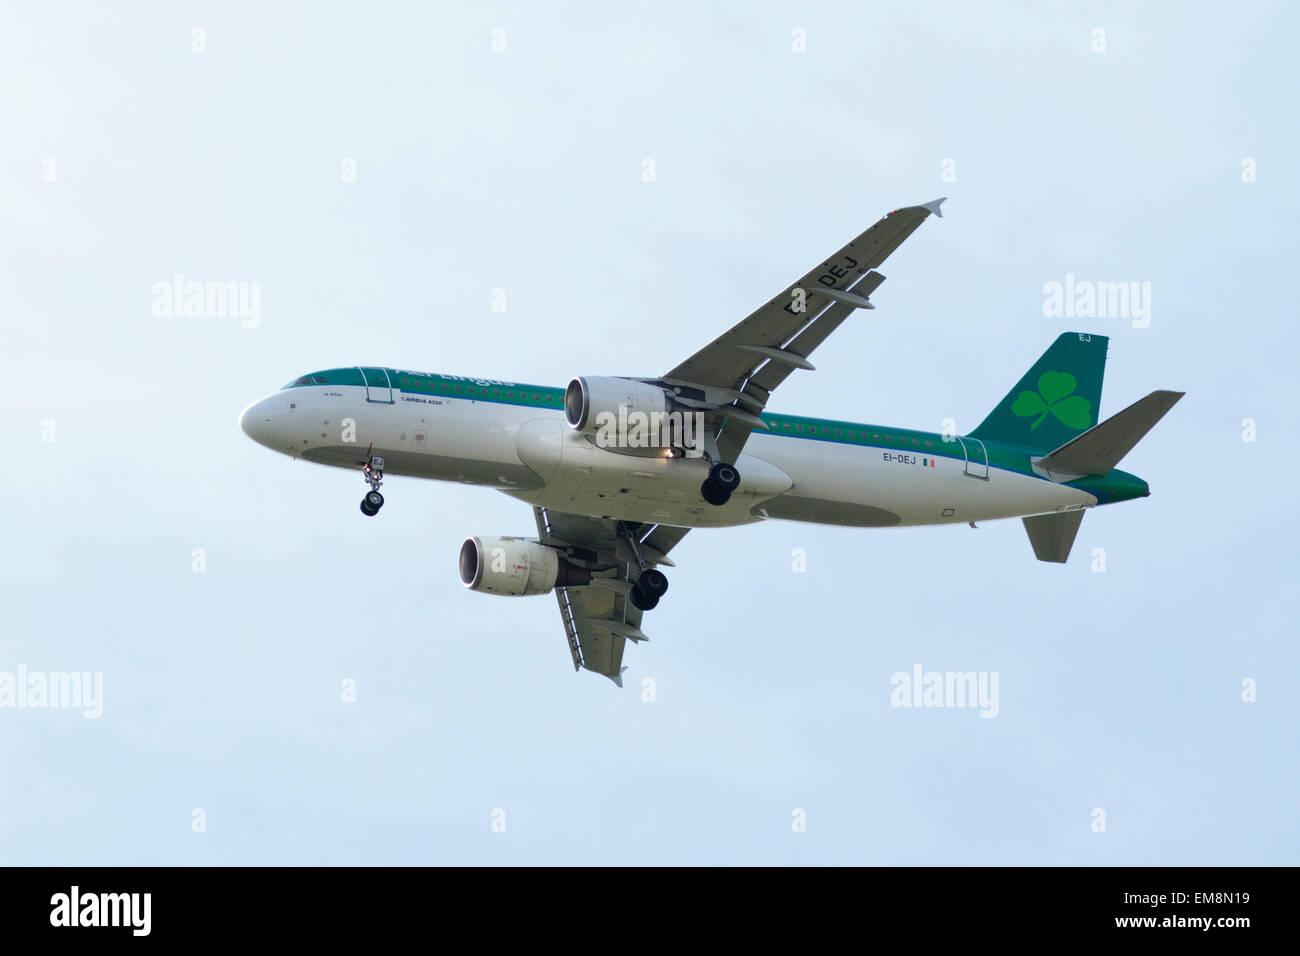 Aer Lingus EI-DEJ (Airbus A320) - Stock Image